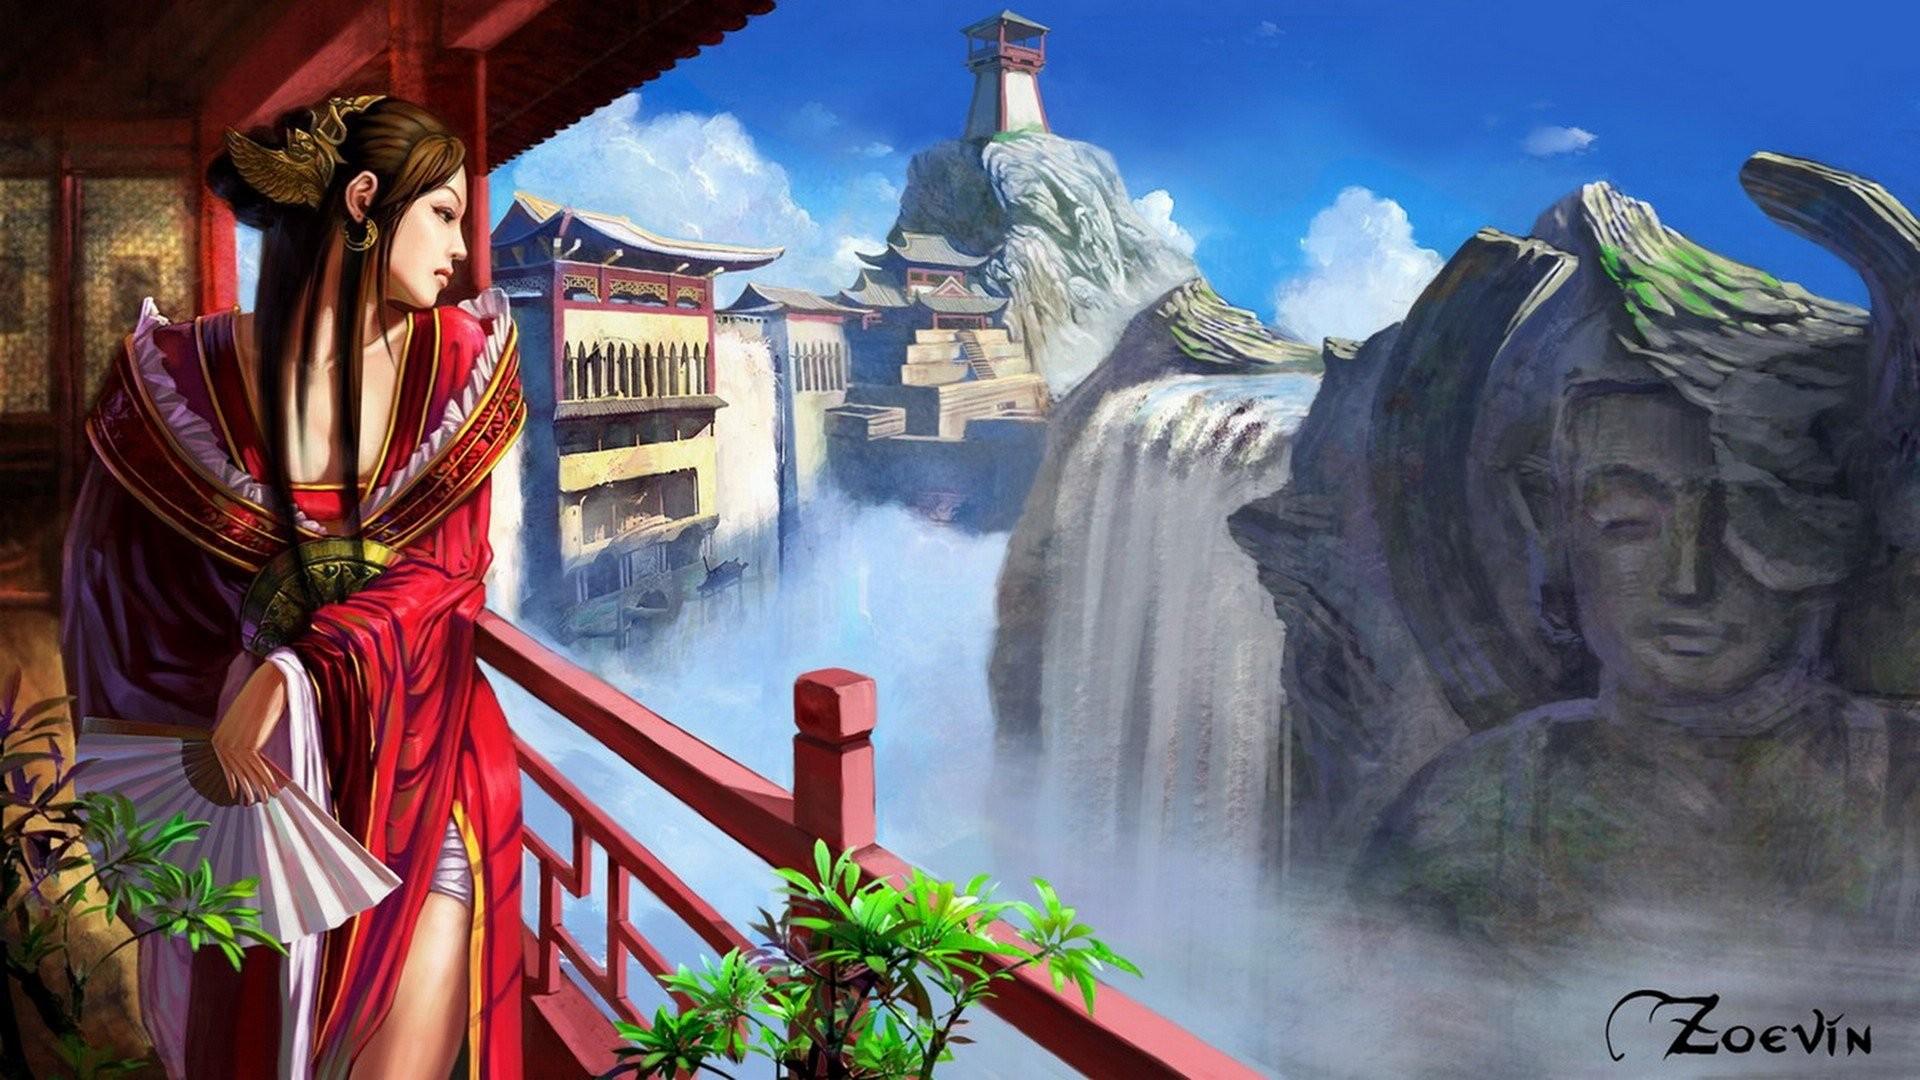 Res: 1920x1080, landscapes, Fantasy, Art, Digital, Art, Artwork, Anime, Anime, Girls  Wallpapers HD / Desktop and Mobile Backgrounds